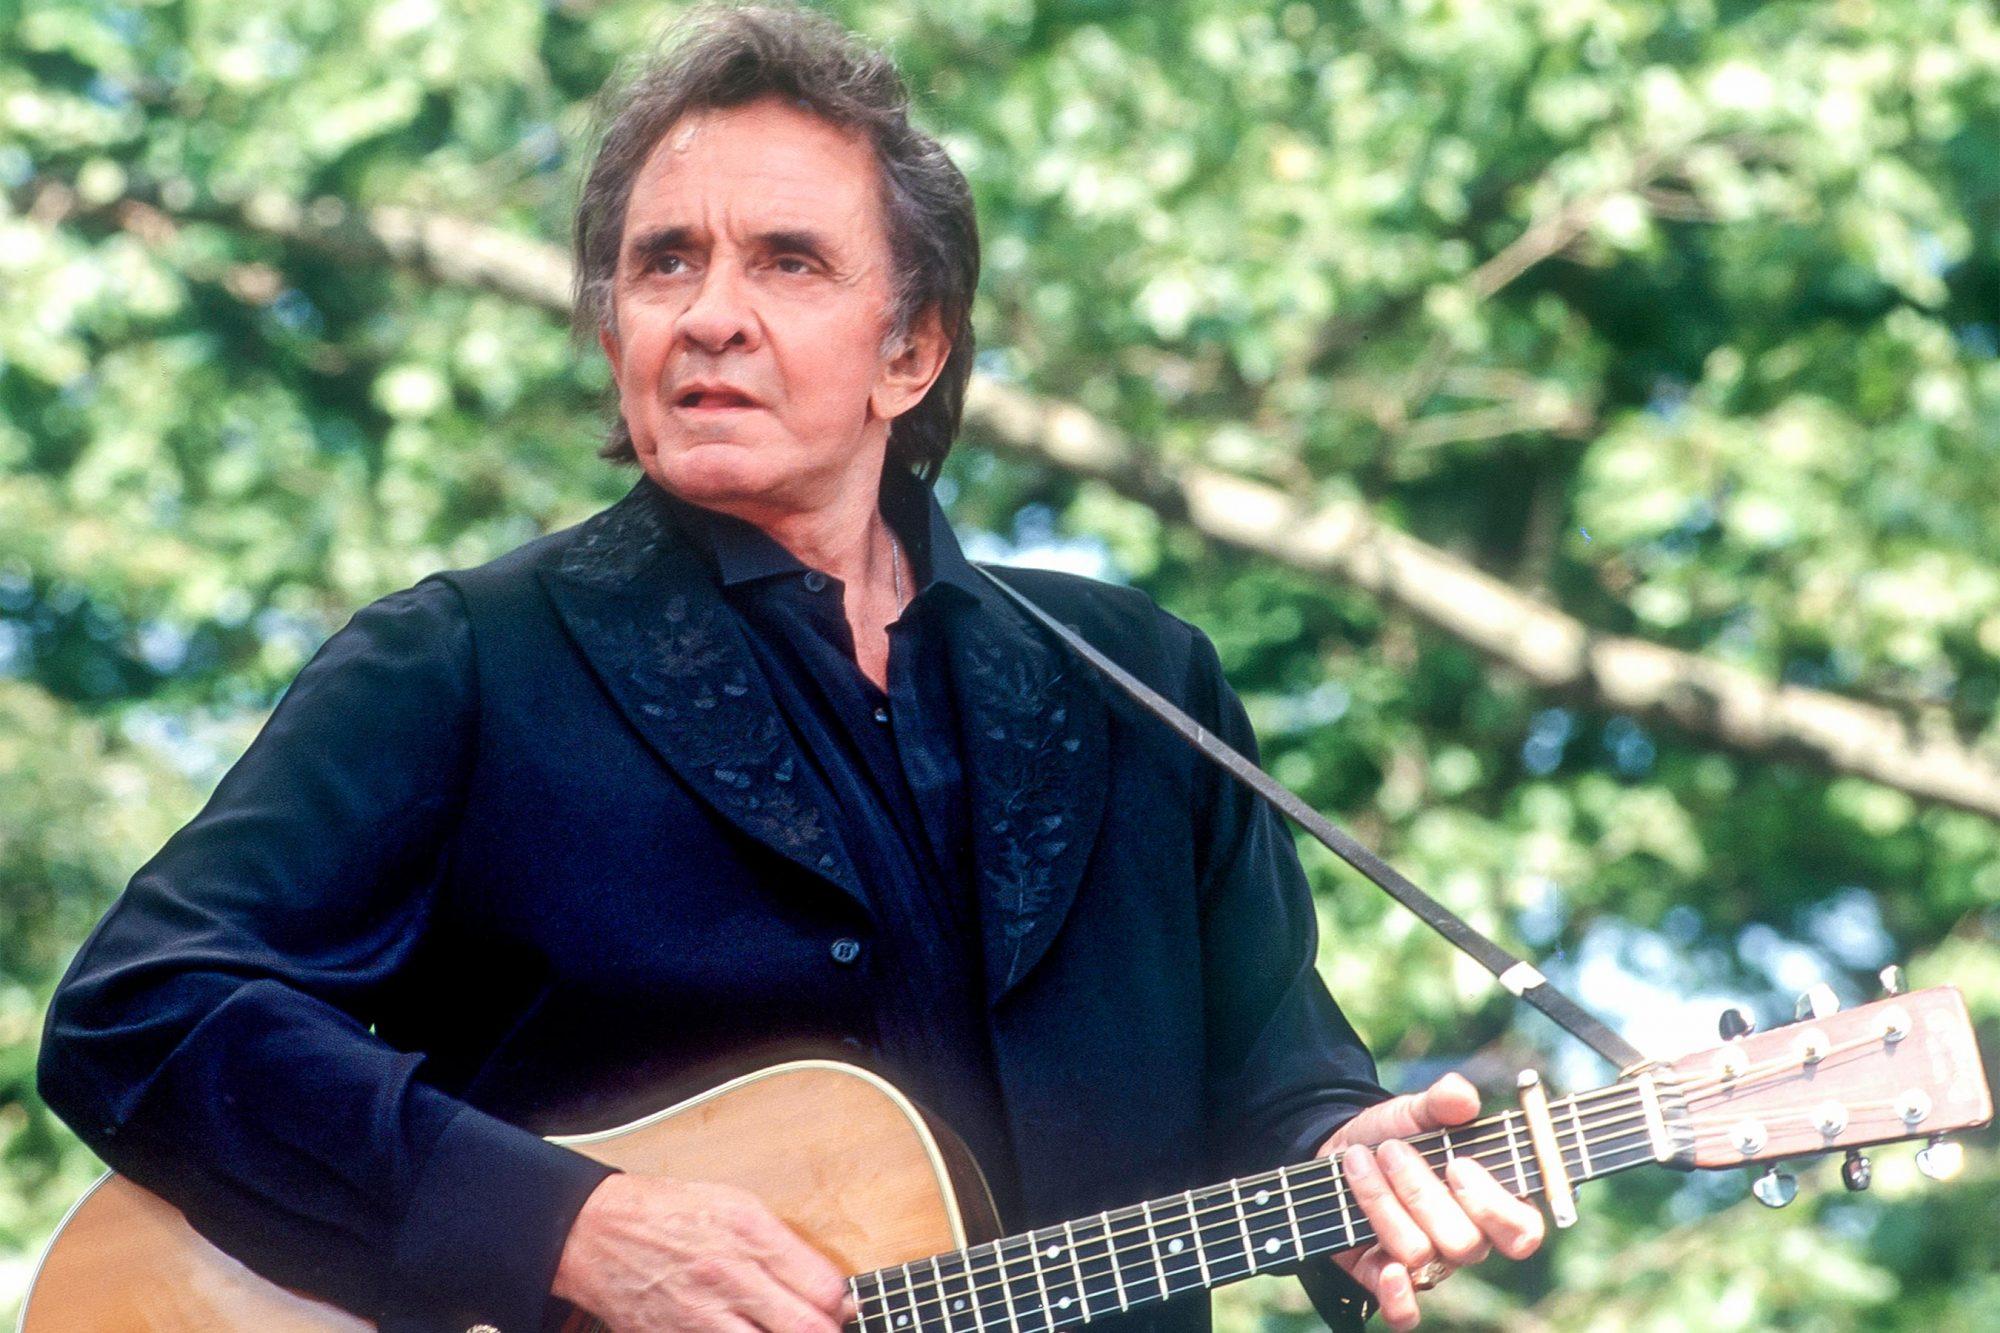 Johnny Cash At Harlem Meer